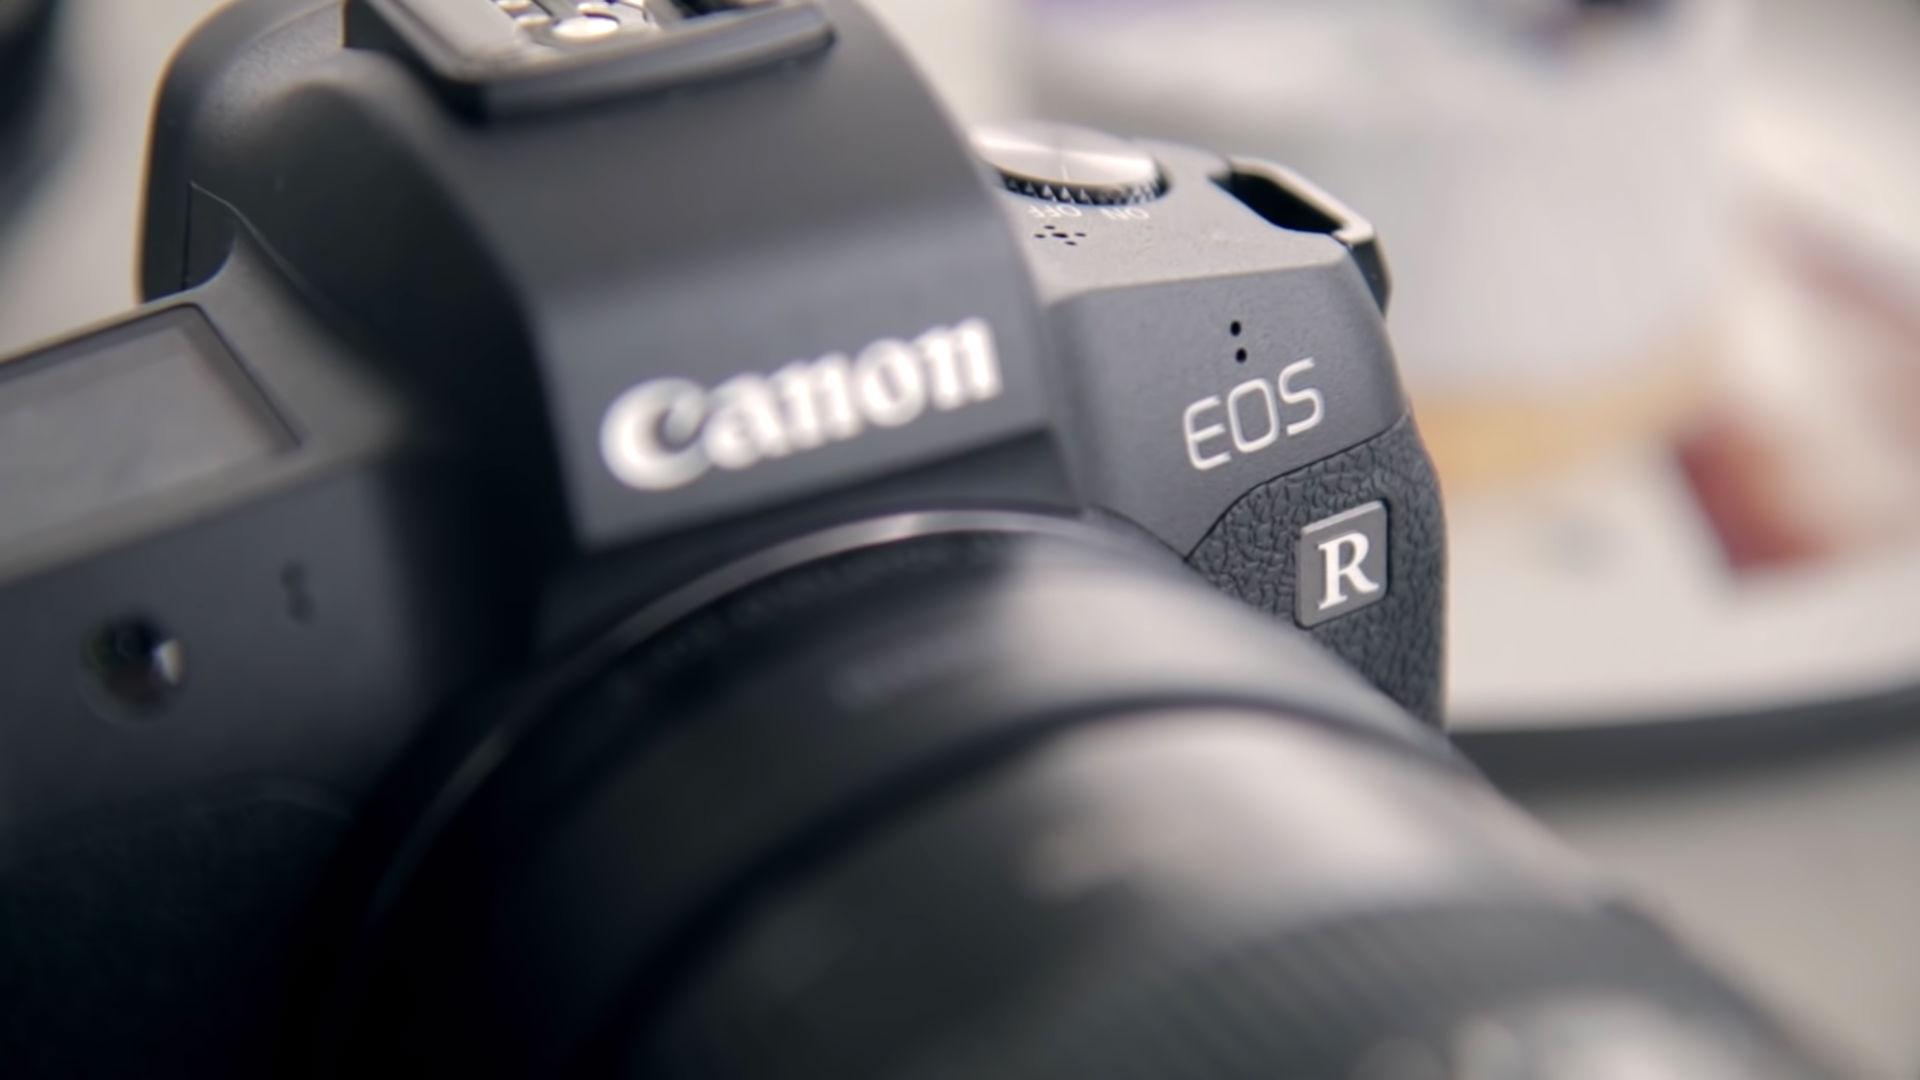 canon eos r price image